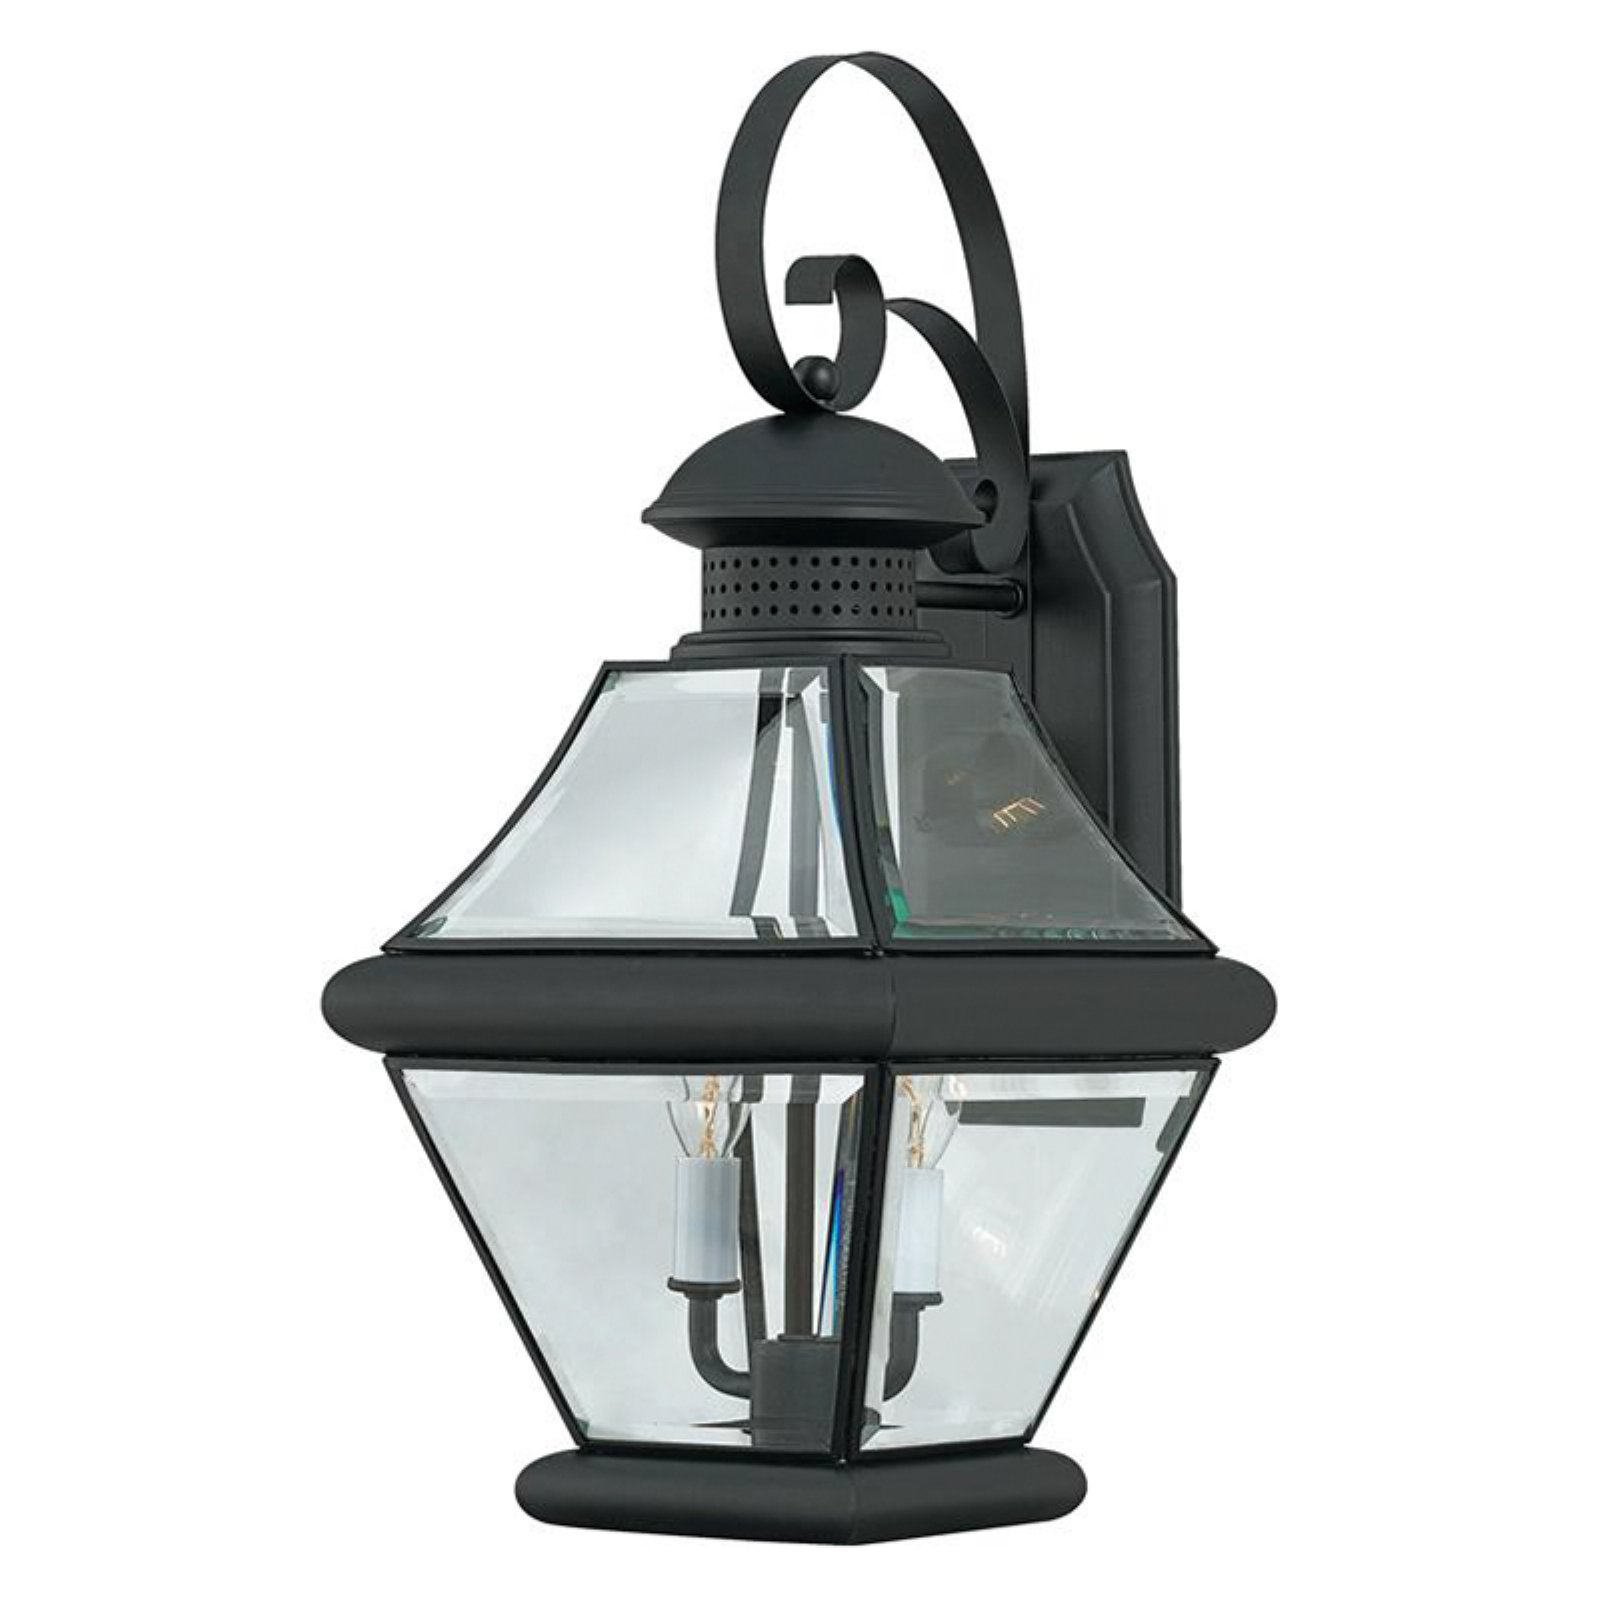 Quoizel Rutledge RJ84 Outdoor Wall Lantern